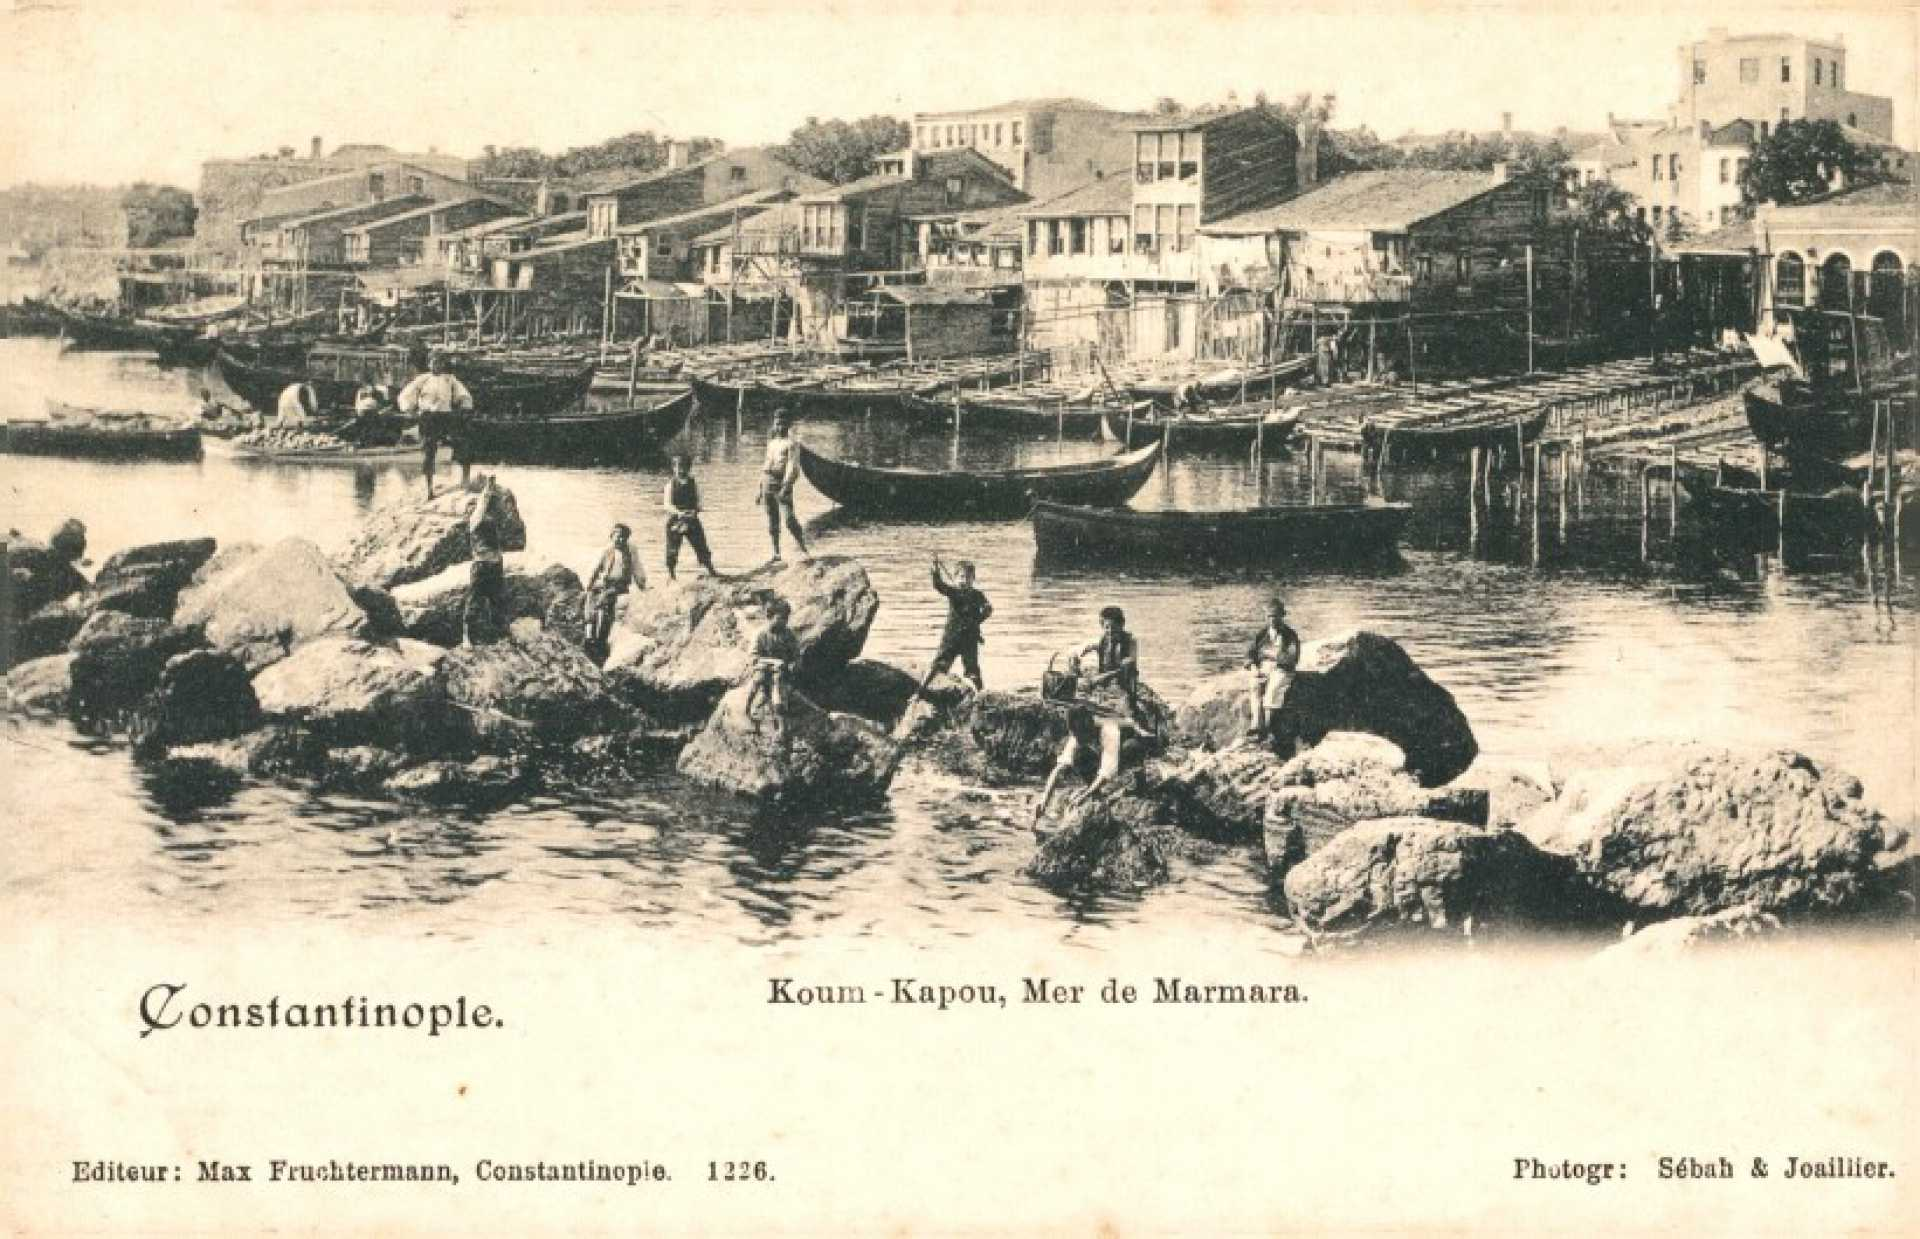 Koum-Kapou. Mer de Marmara. Constantinople